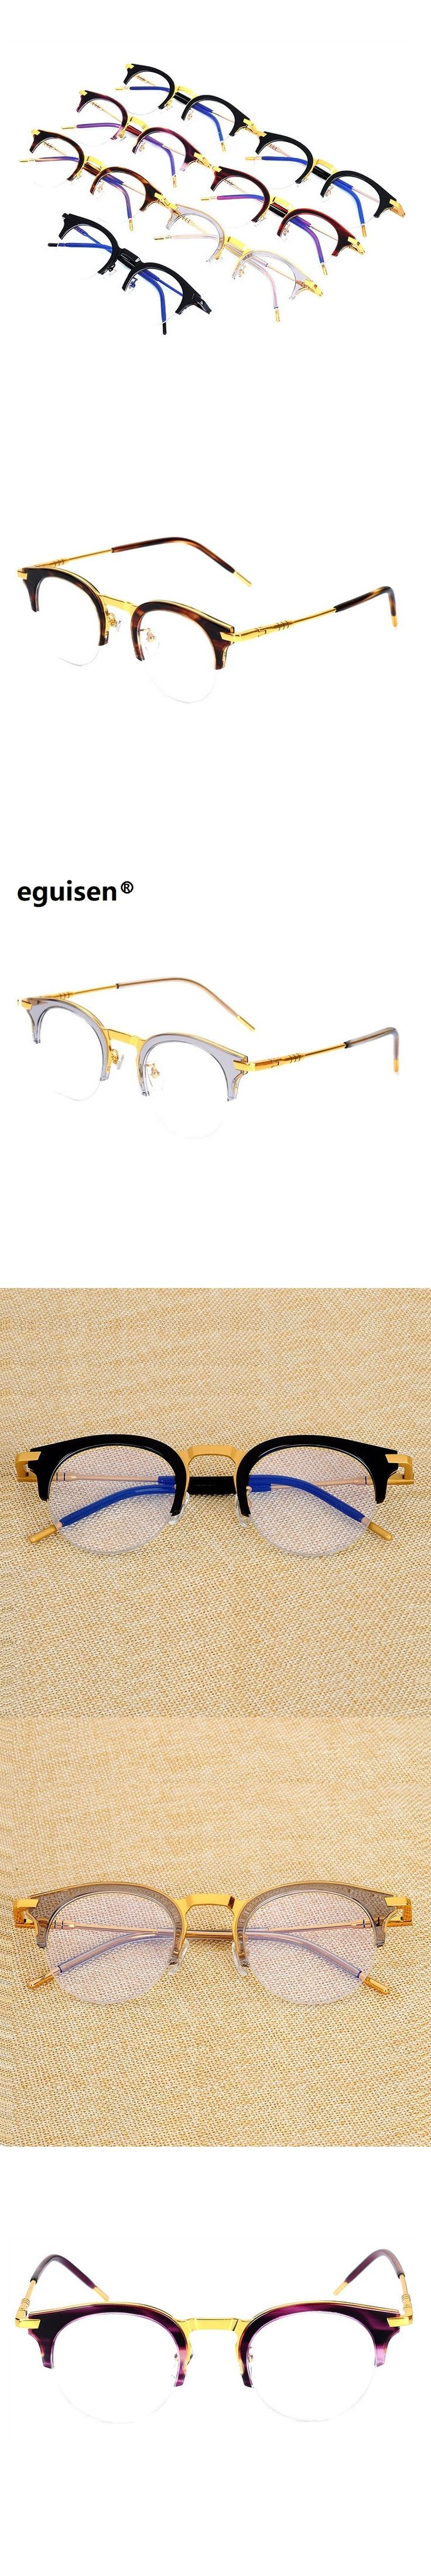 52-18-148 High grade super light plate retro spring legs male and female semi-rimless glasses frame mirror 90S-5 oculos de grau